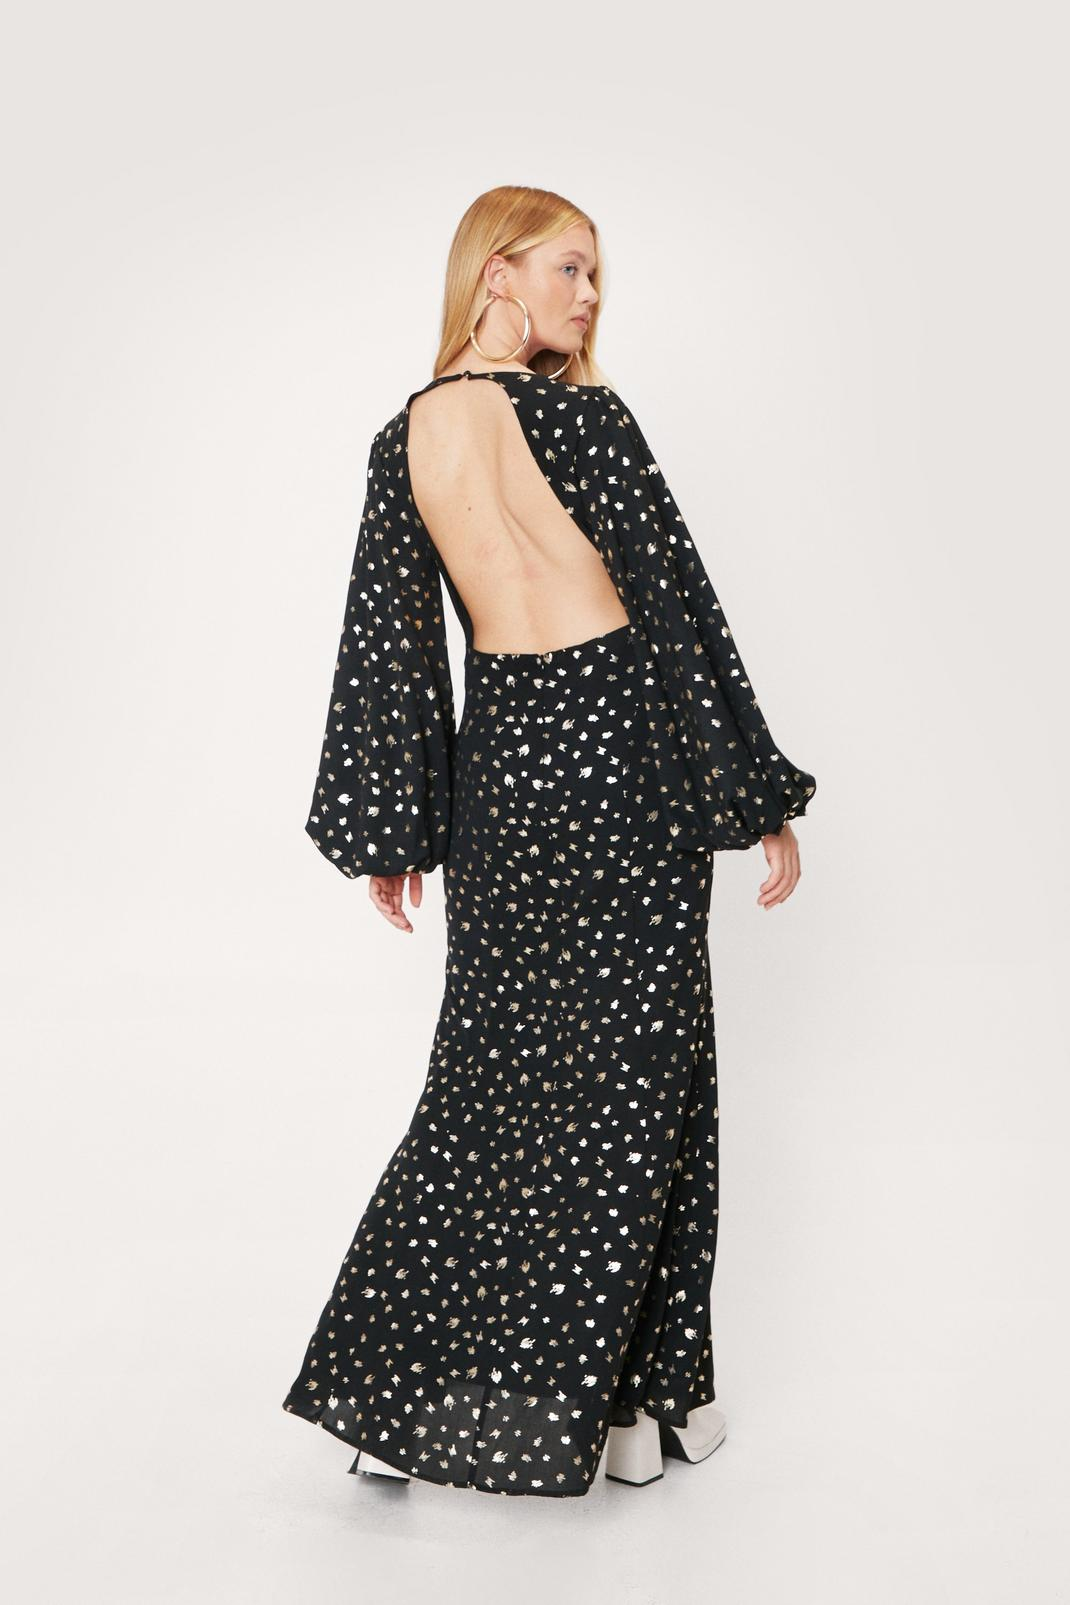 Metallic Polka Dot Backless Maxi Dress